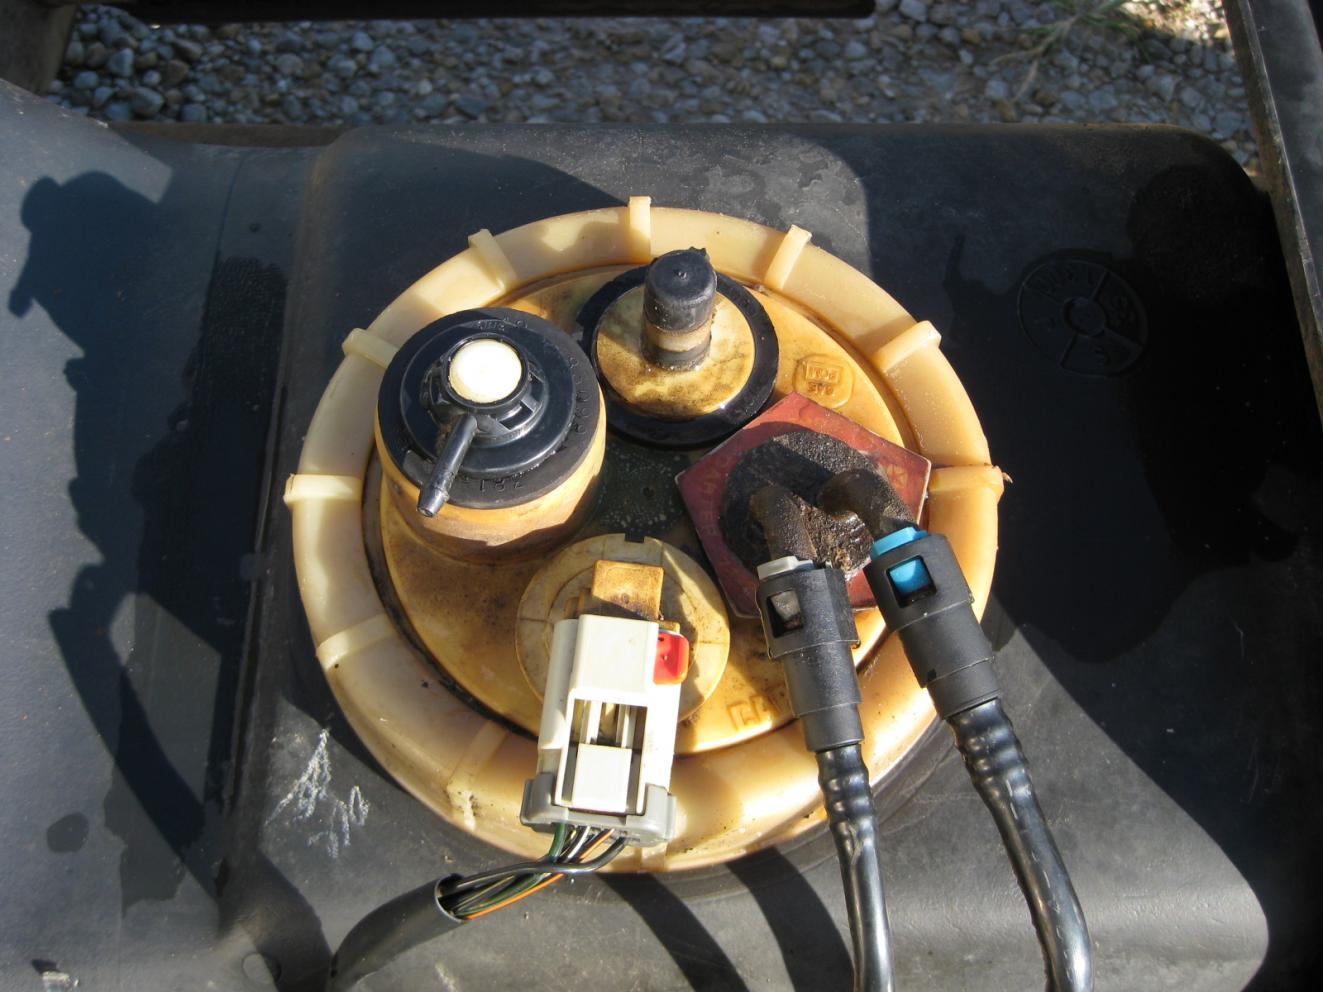 2003 Impala Fuel Gauge Wiring Diagram 94 12 Valve Fuel Guage Not Working Diesel Bombers